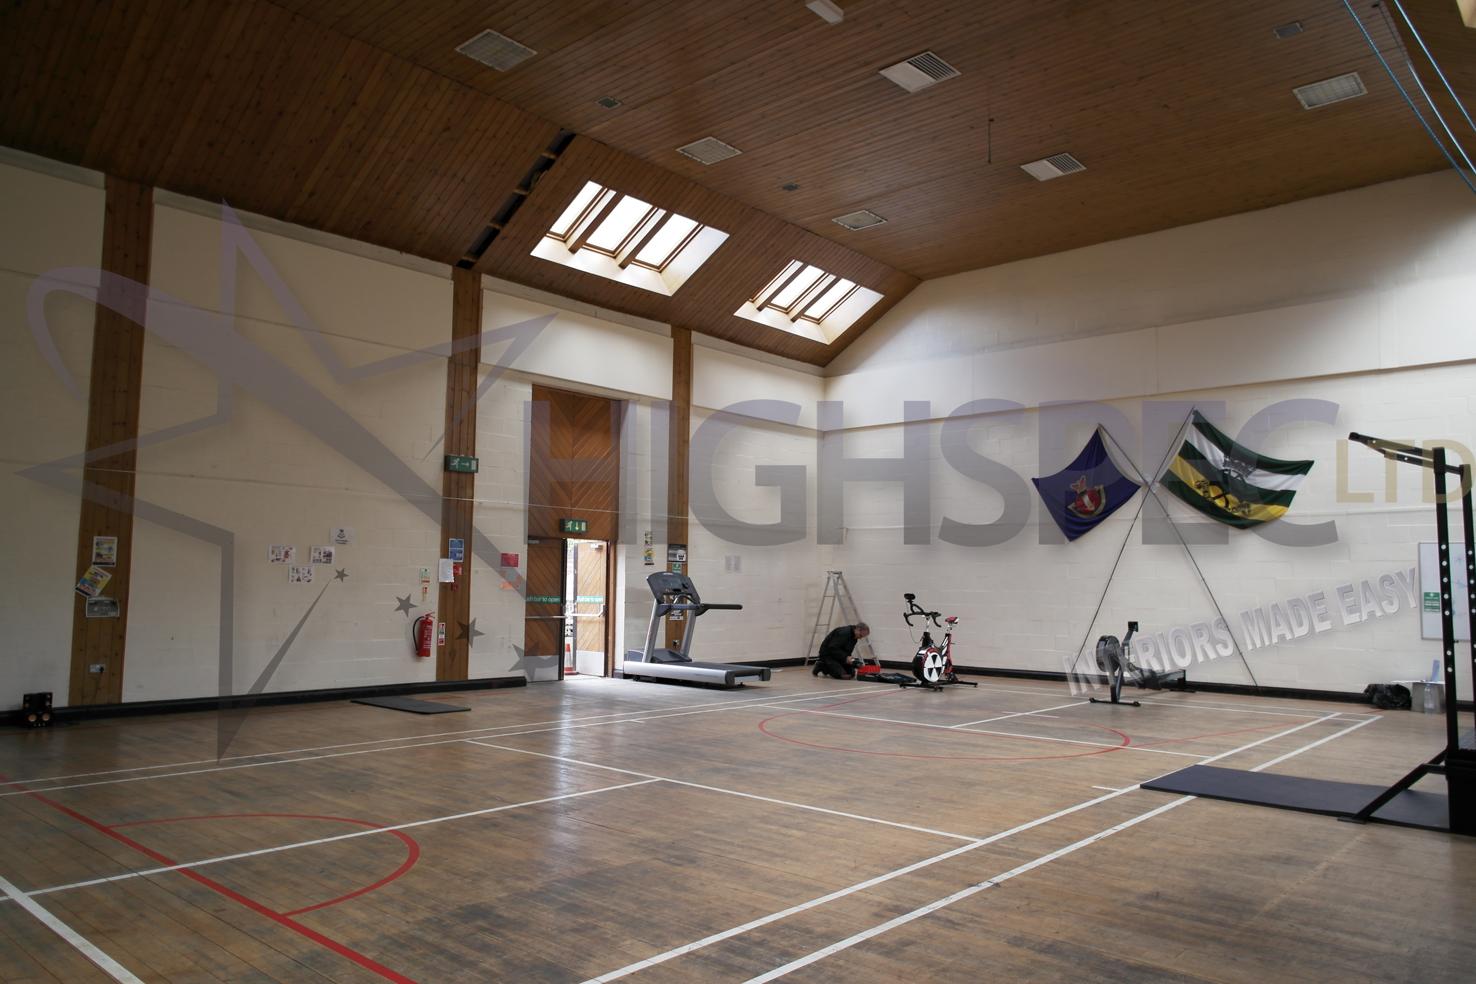 Sports hall lining decor